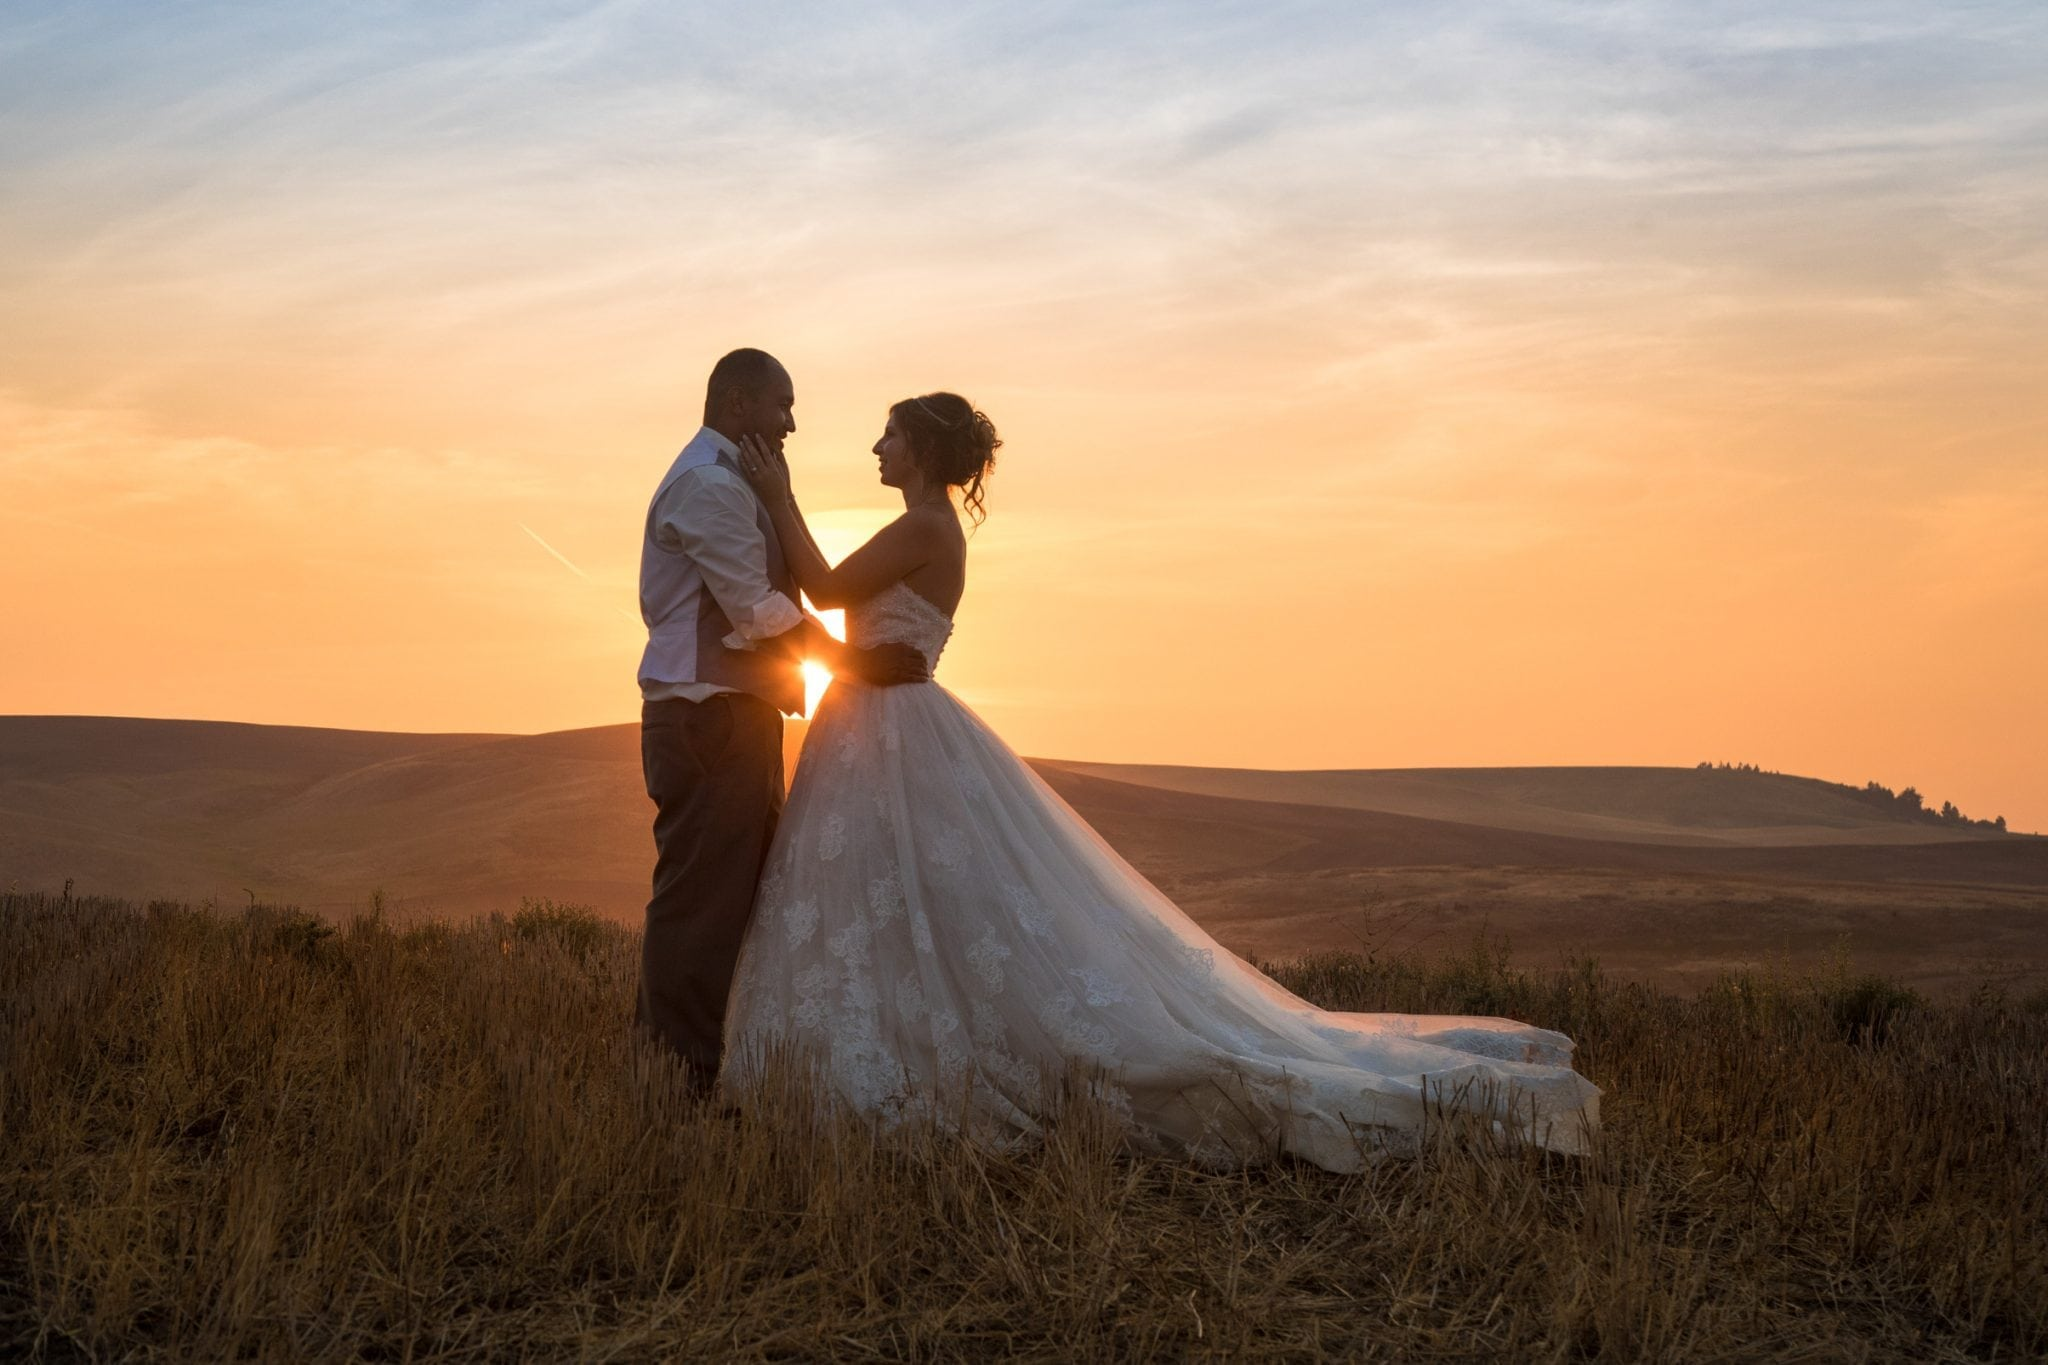 Country wedding photo in Spokane WA